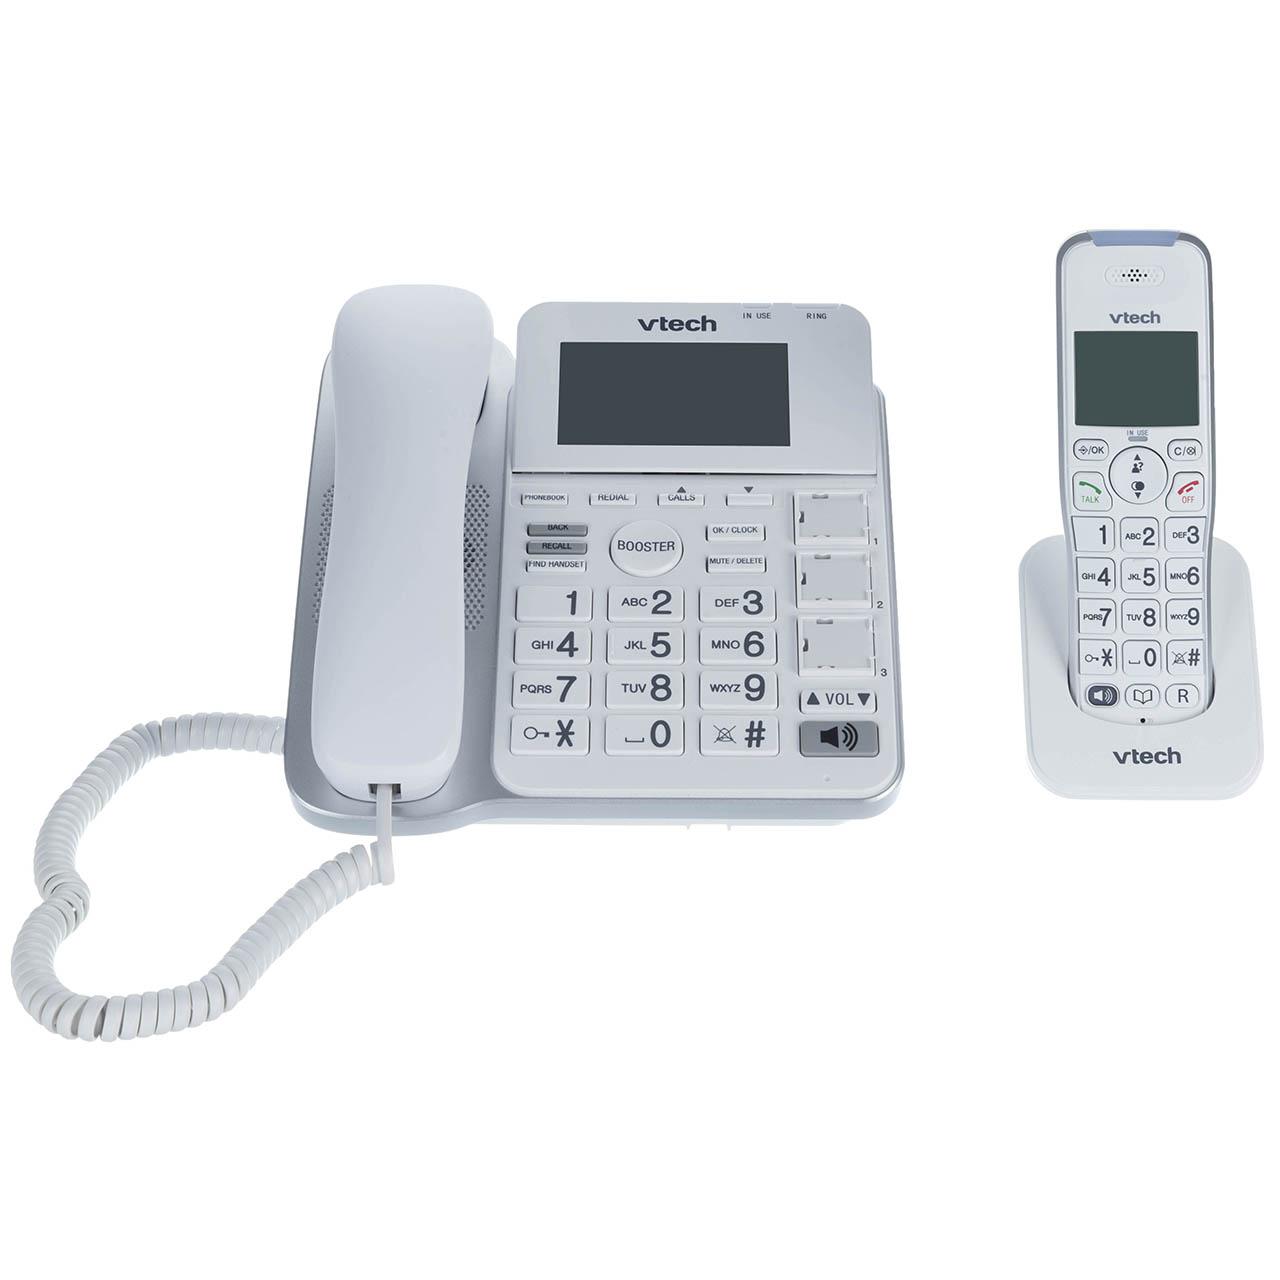 فروش اقساطی تلفن بی سیم وی تک مدل CRL54102